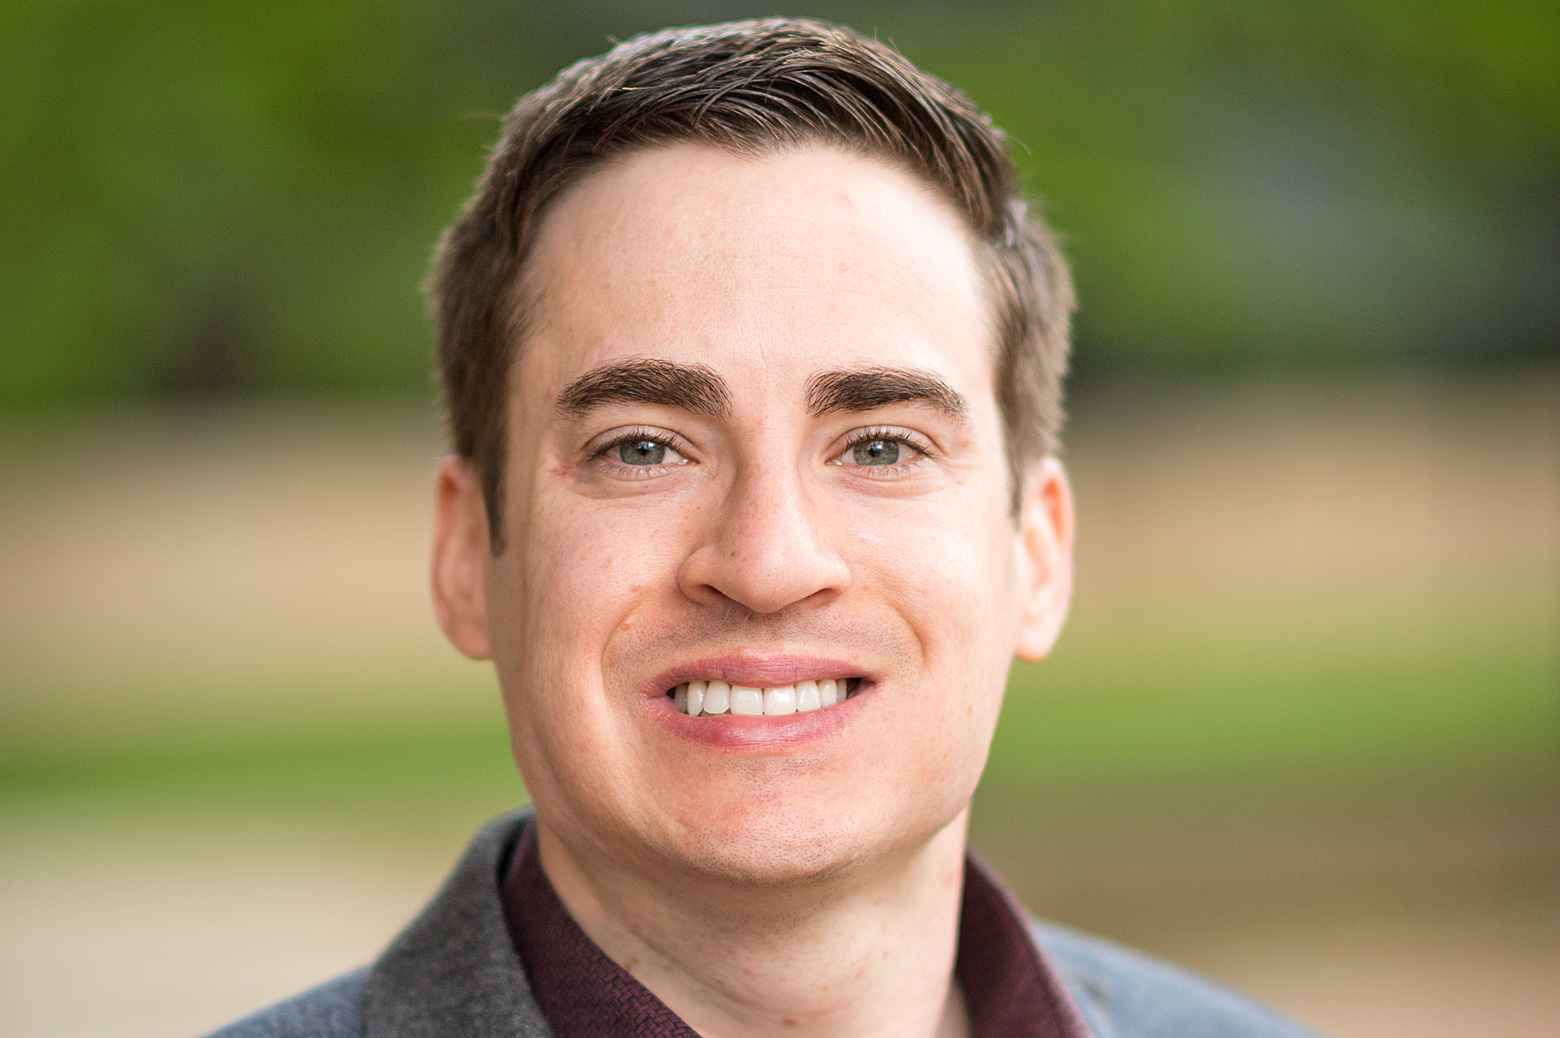 image of Bryan Goldsmith